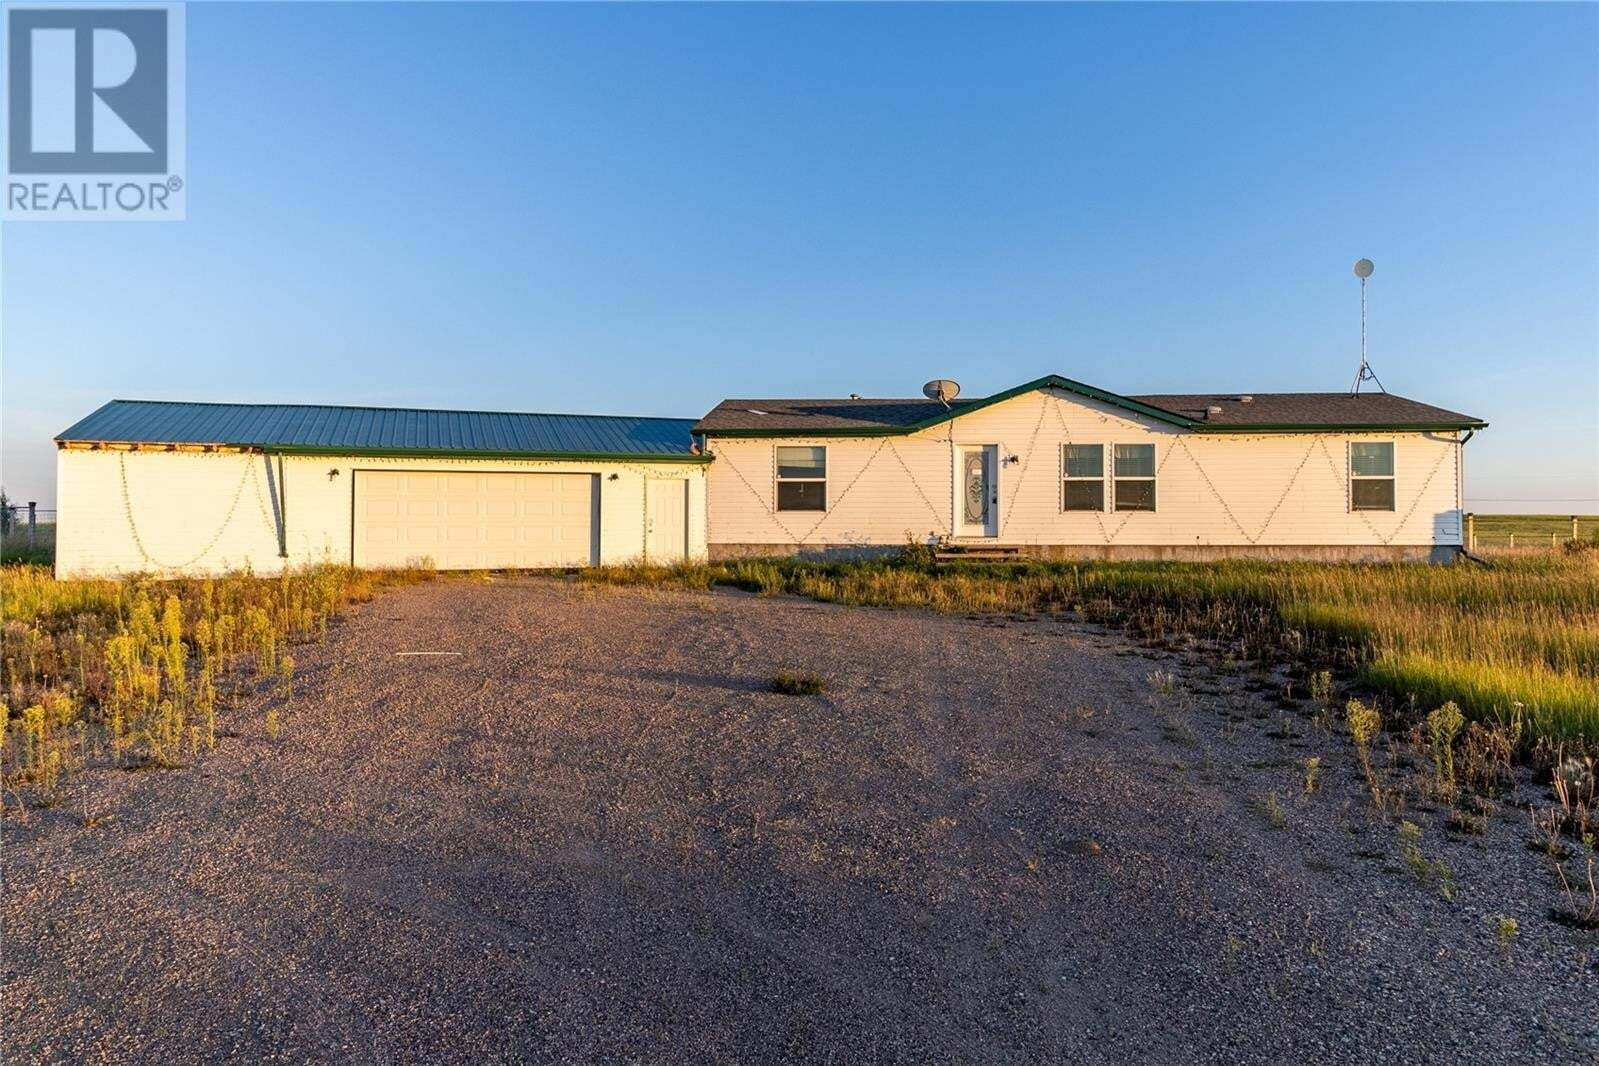 House for sale at Haultain Road Estate Dundurn Rm No. 314 Saskatchewan - MLS: SK819514